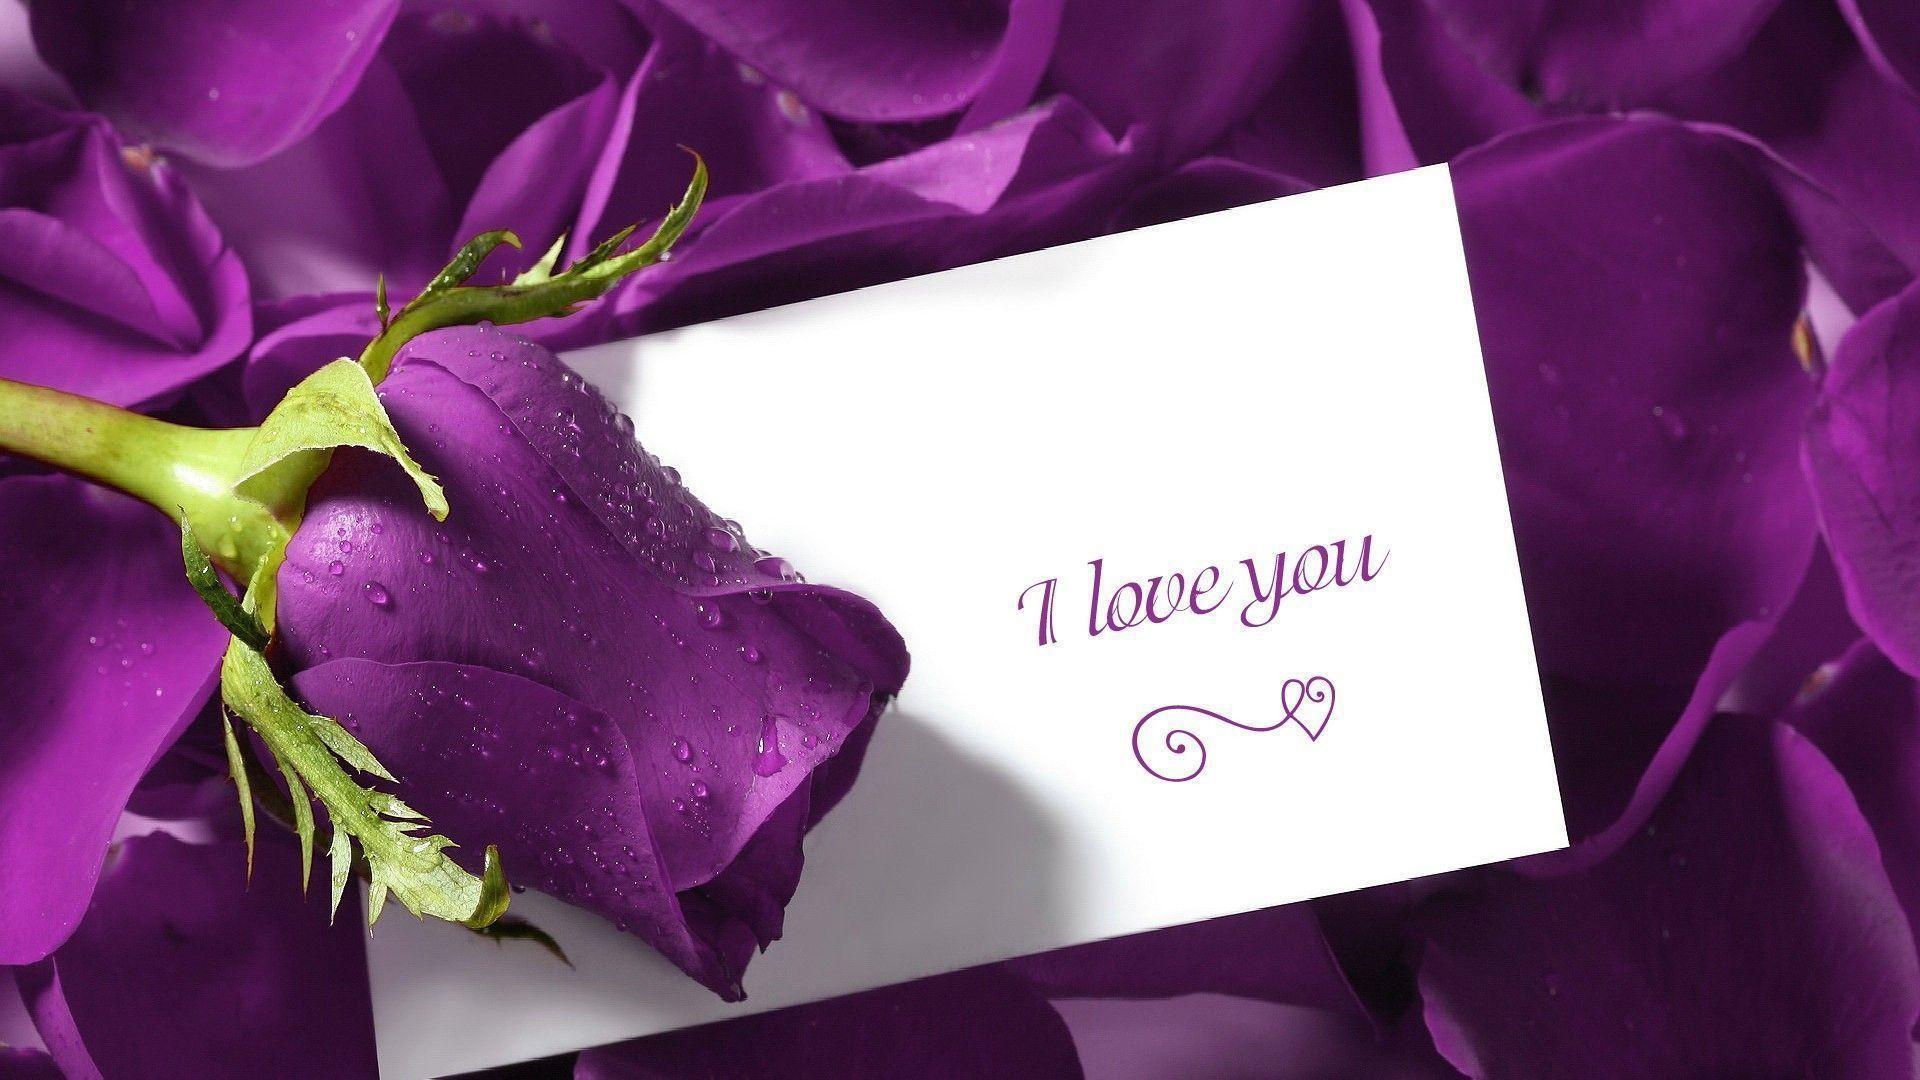 Cute Love And Purple Rose Flower Wallpaper Des #7055 Wallpaper .